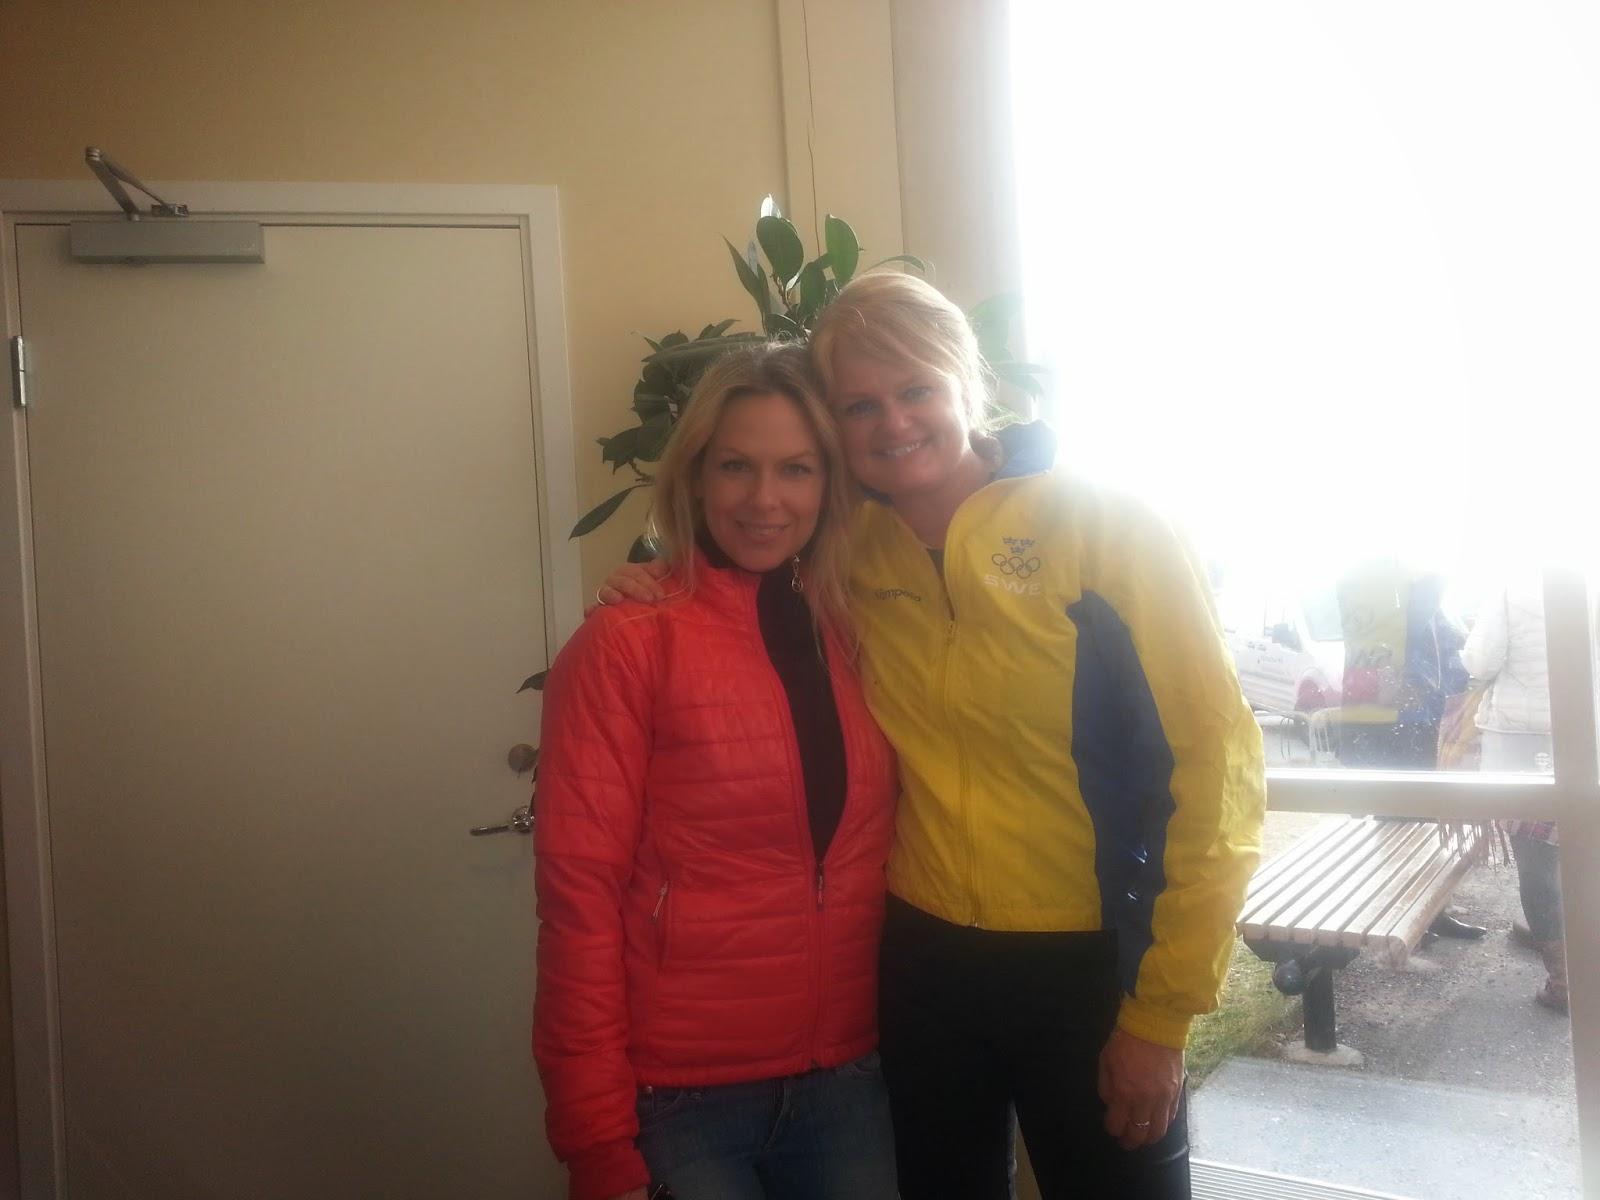 Anette Norberg kins blogg: anette norberg